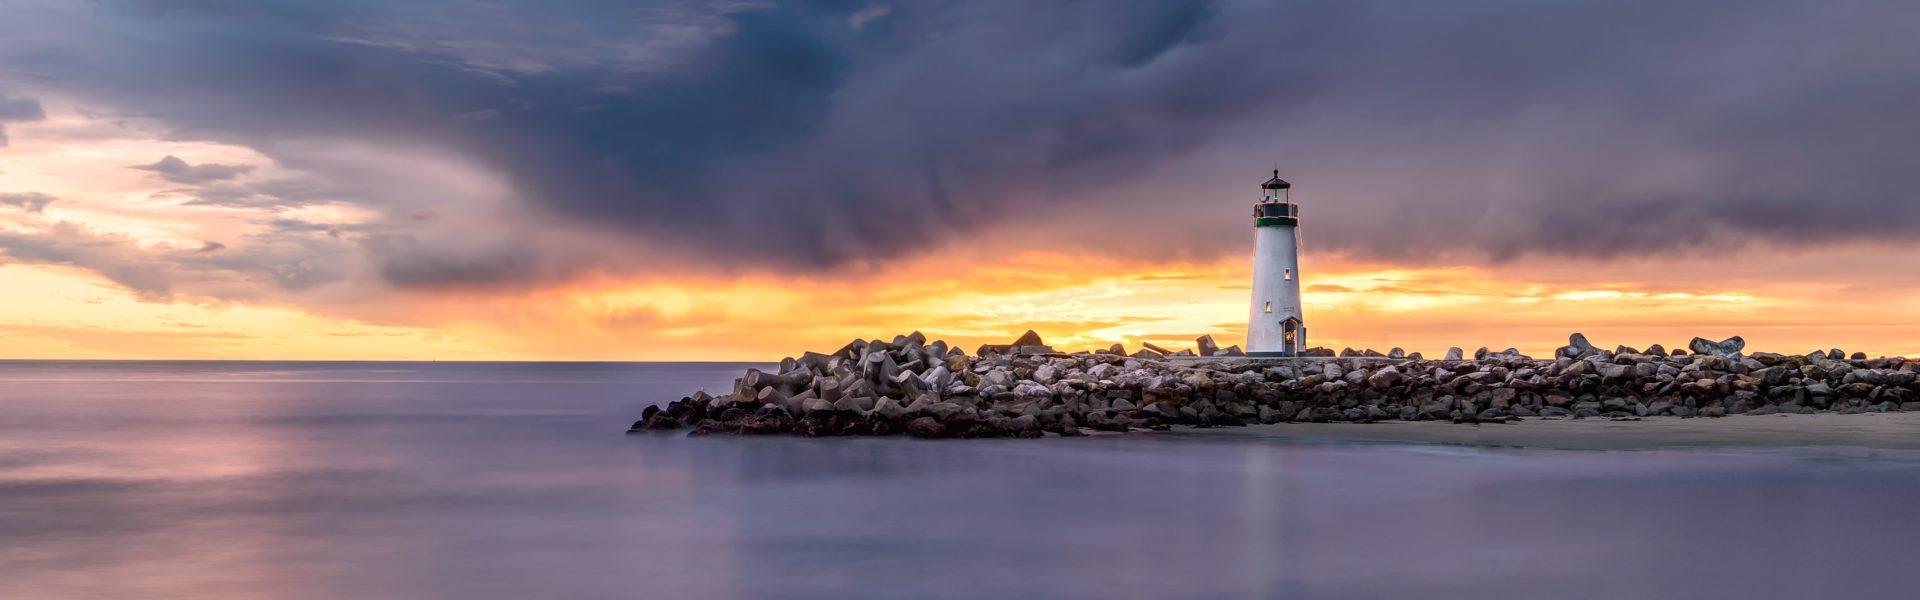 Lighthouse Senior Care Consultants